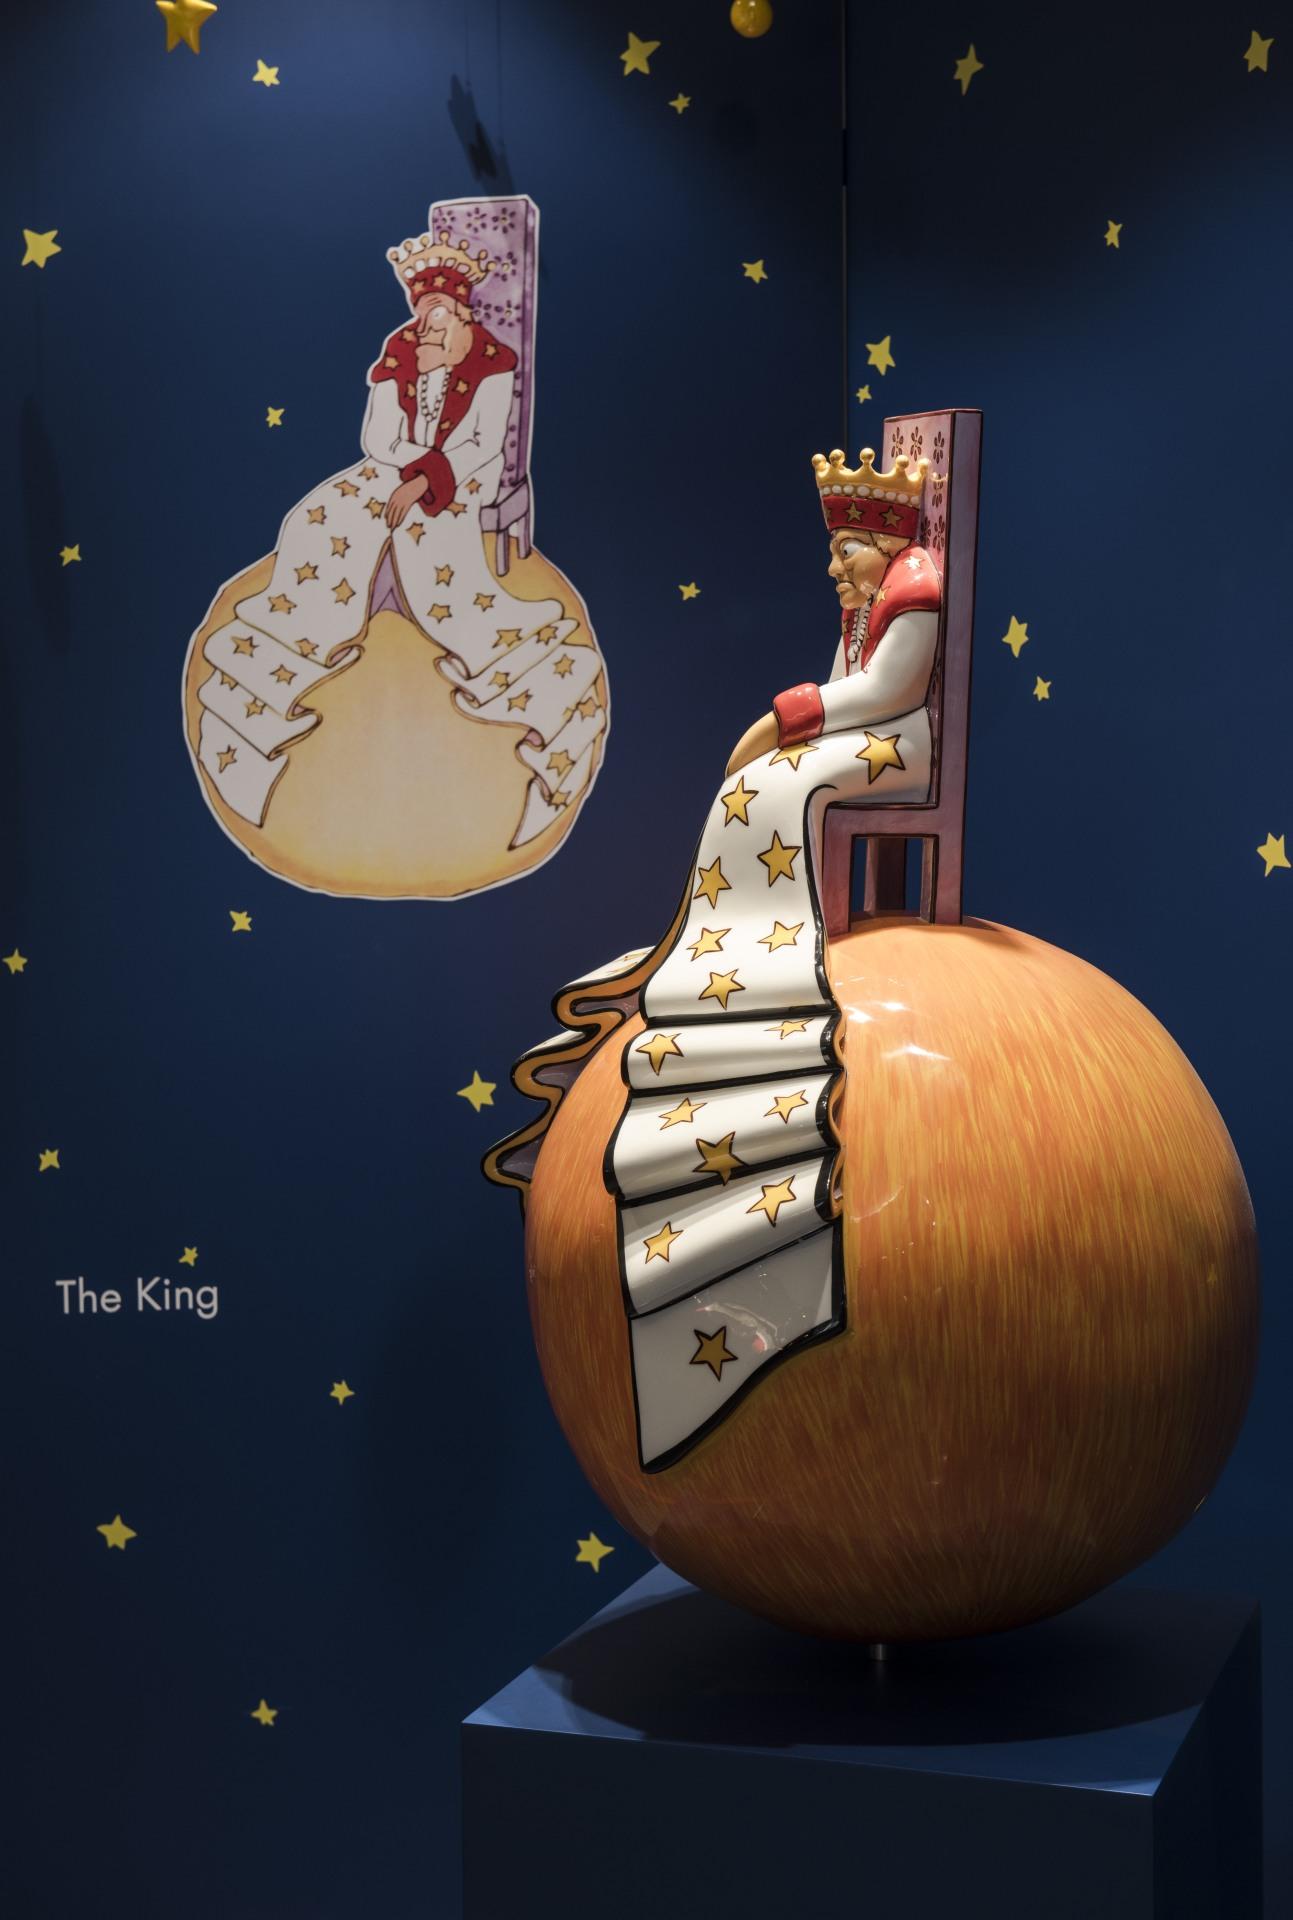 4-The King 1.JPG